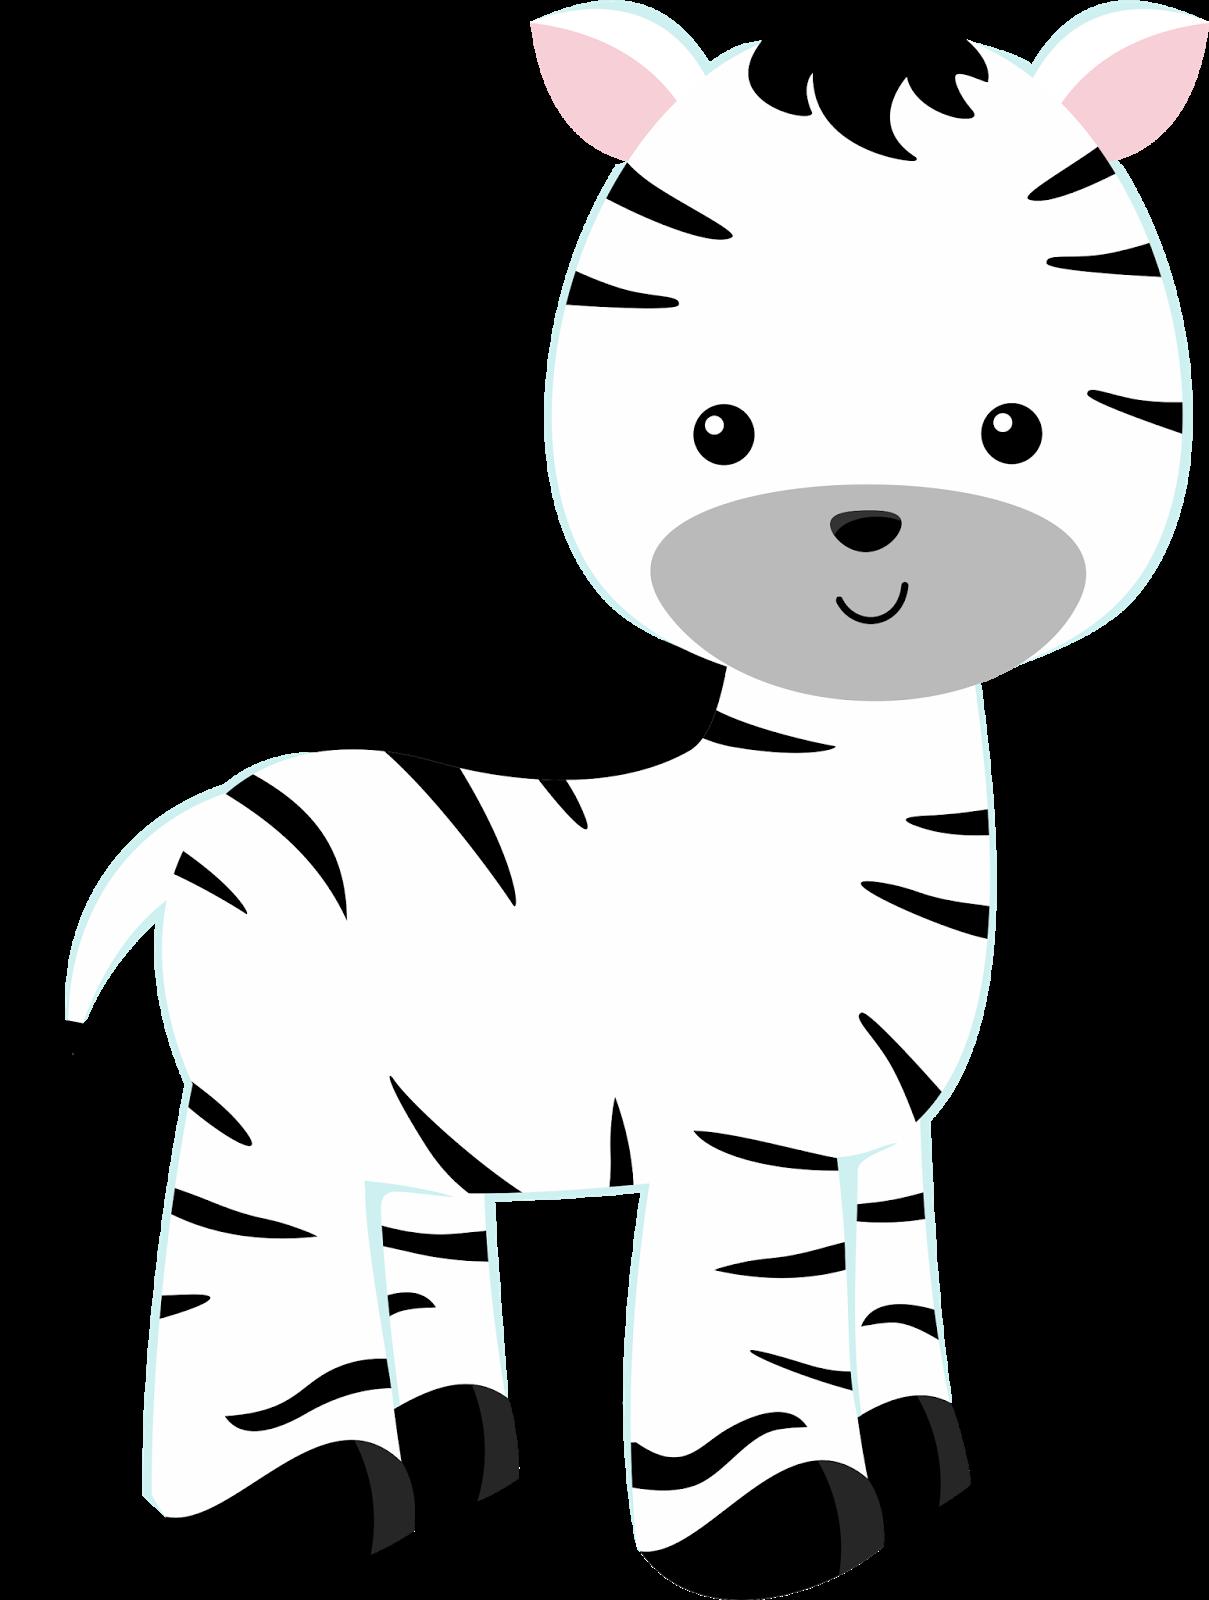 Clipart de Animales de la Selva Bebés. | ideas / dibujos | Pinterest ...